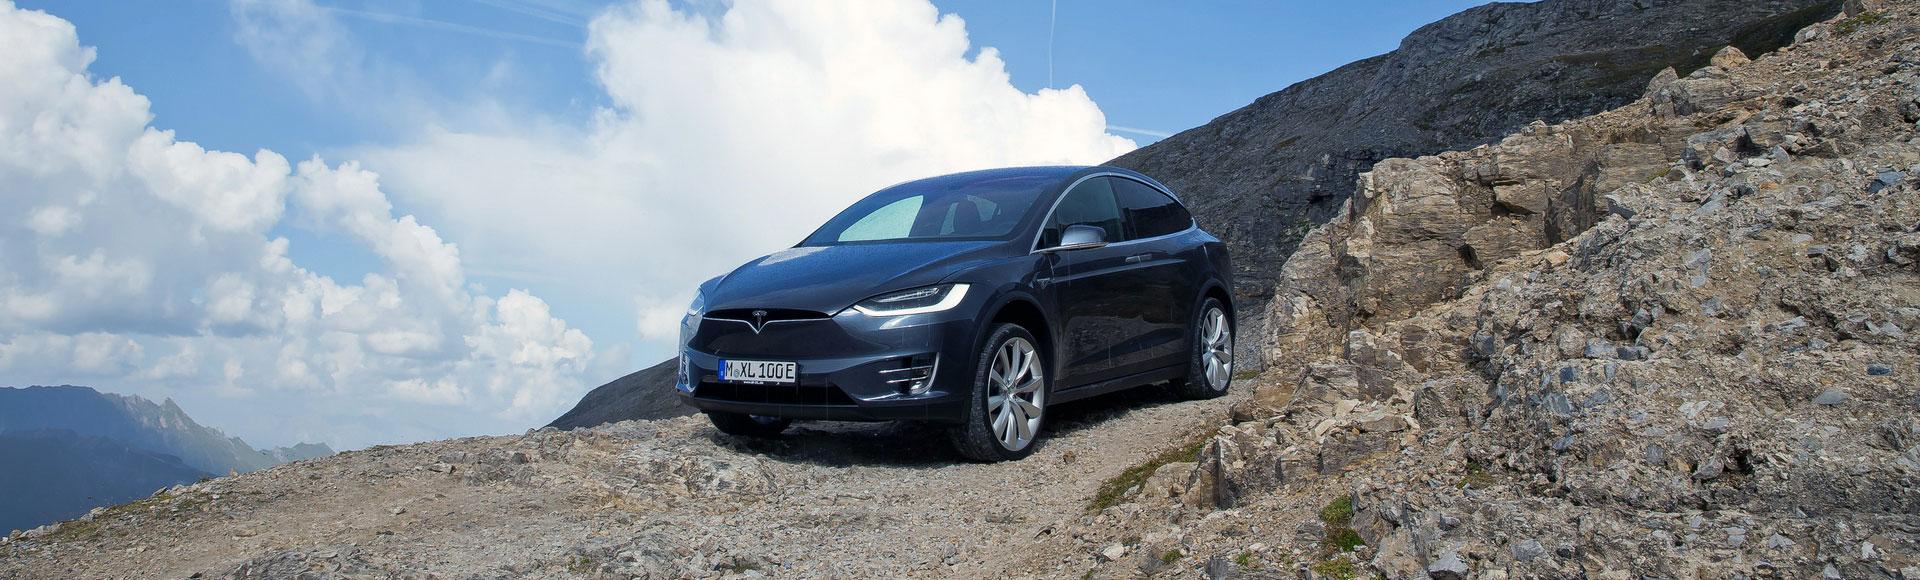 Tesla Model X 2016 329 Sommer